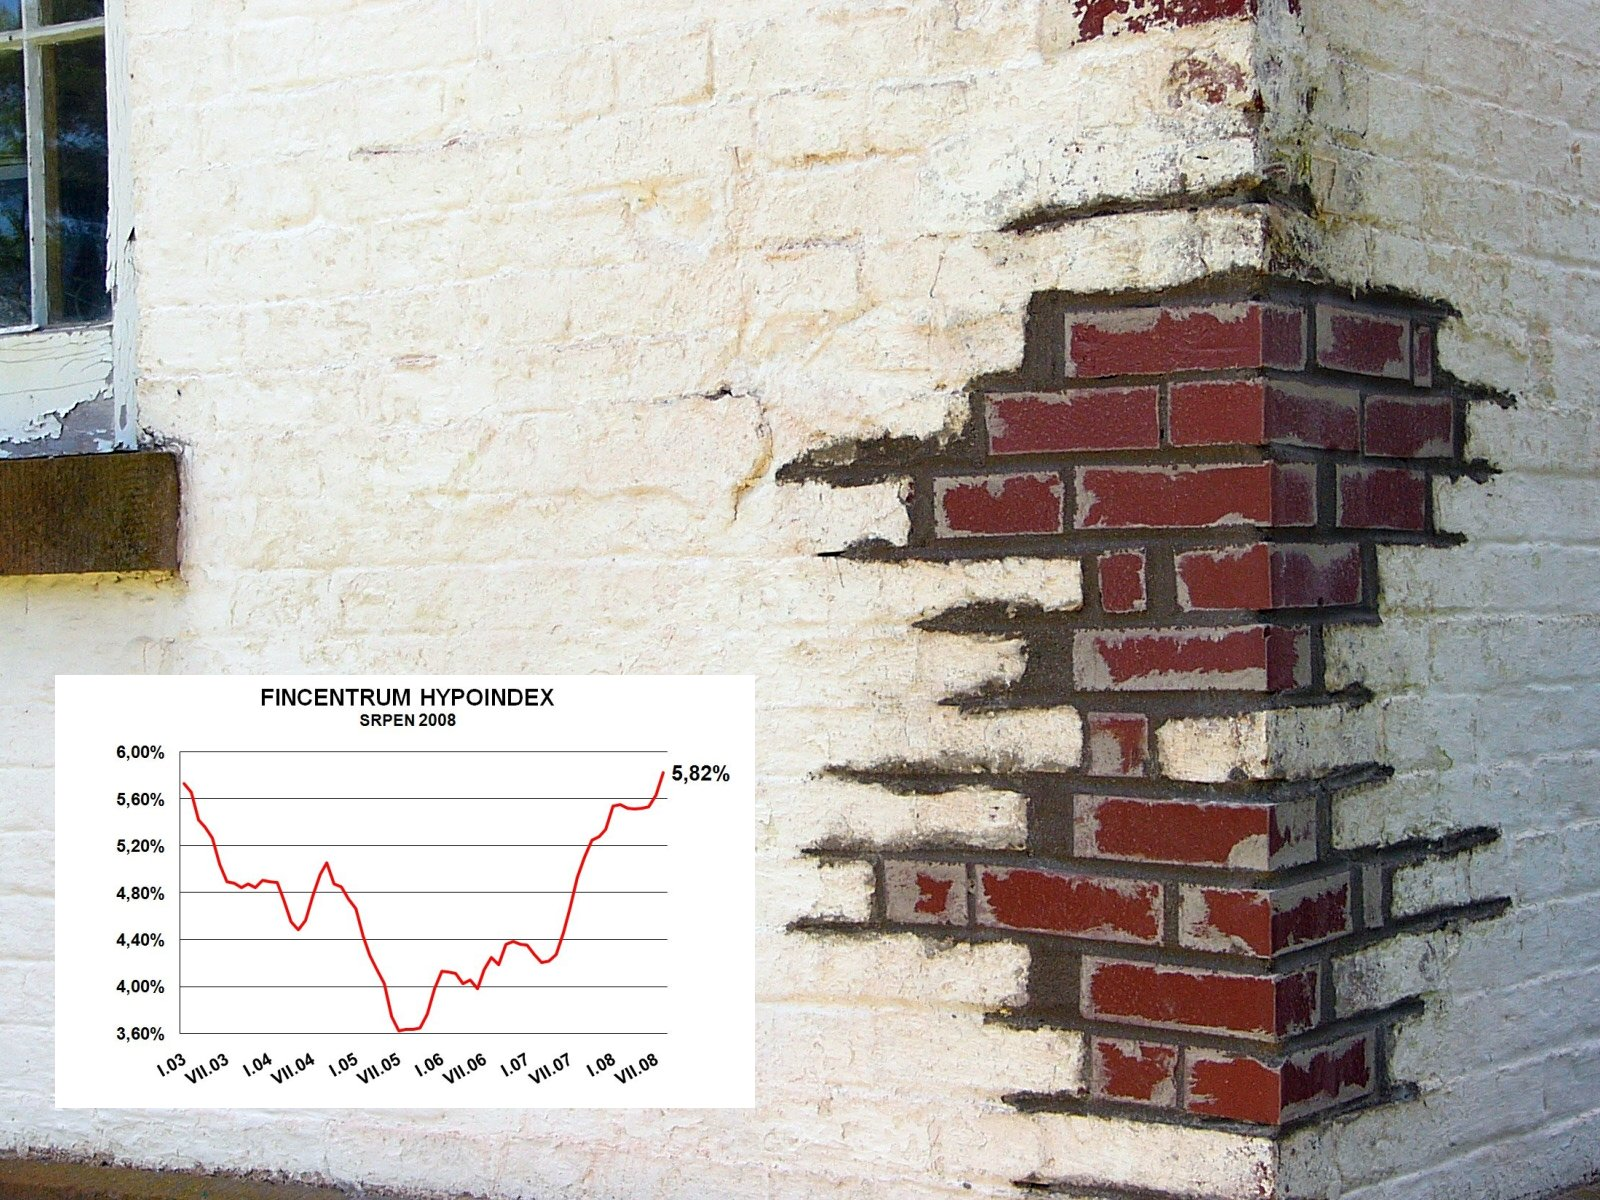 Hypoindex srpen 2008: Úrokové sazby na maximu